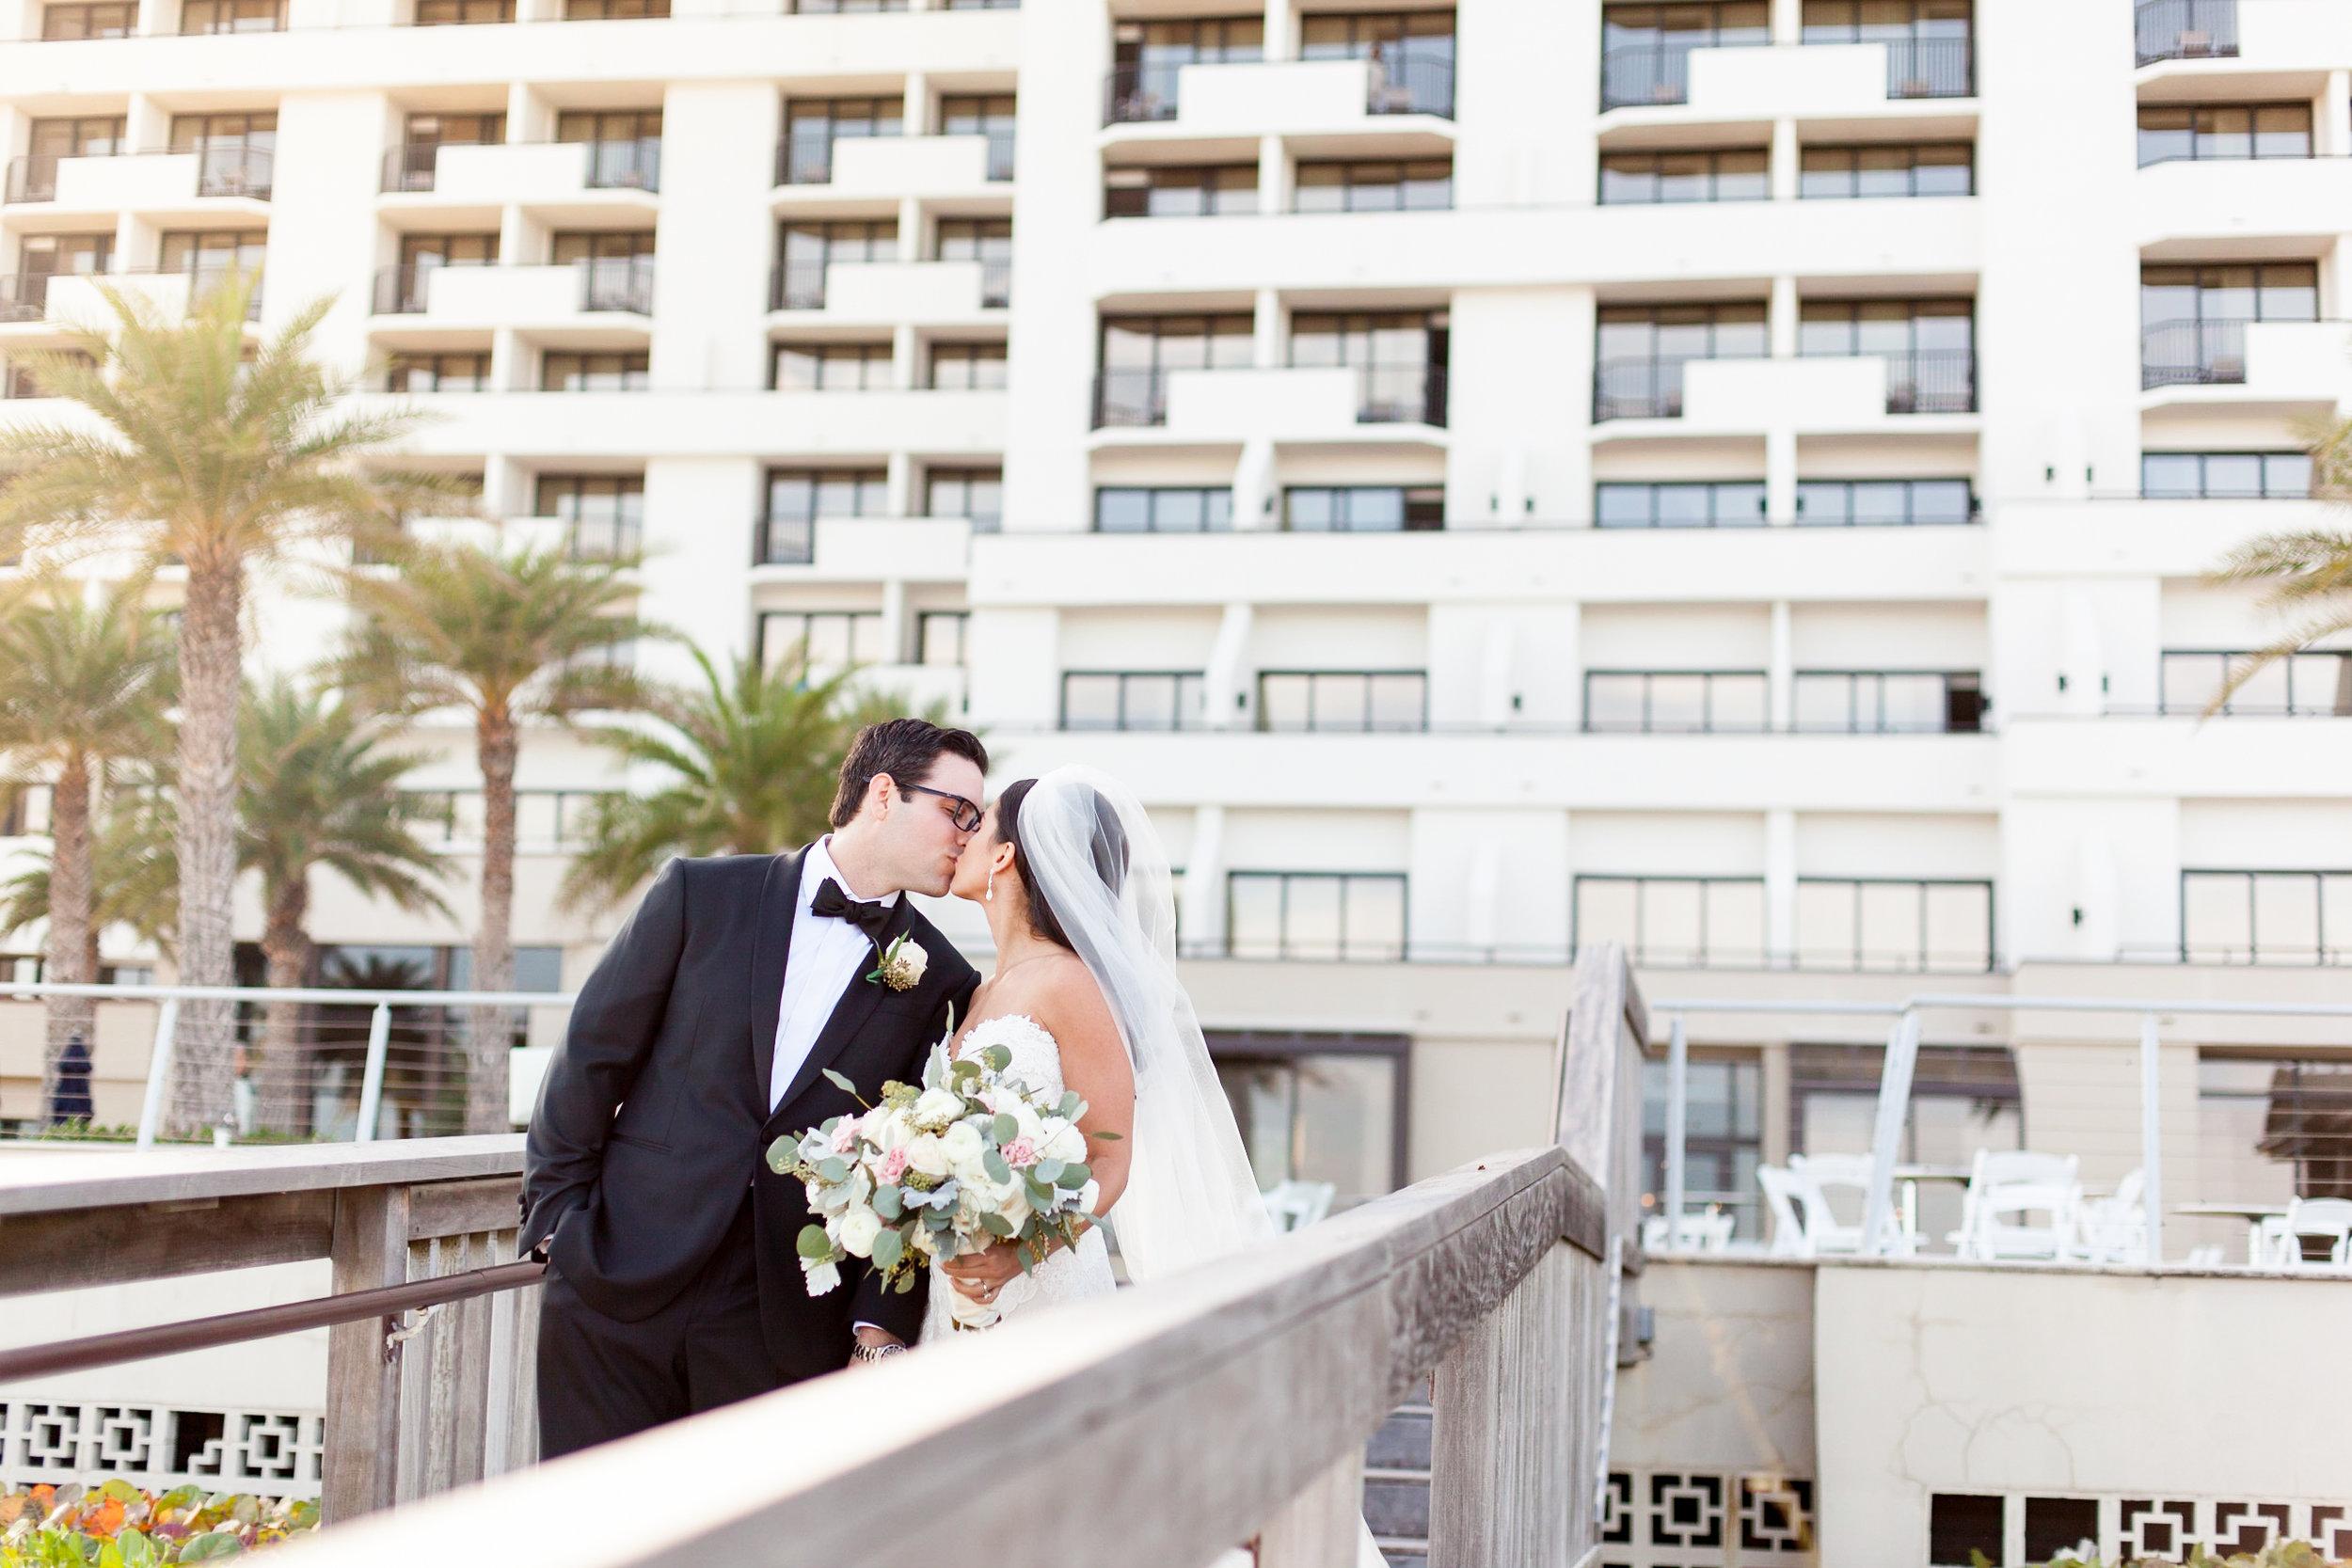 harbor beach marriott ft lauderdale florida wedding by kelilina photography and films-4.jpg